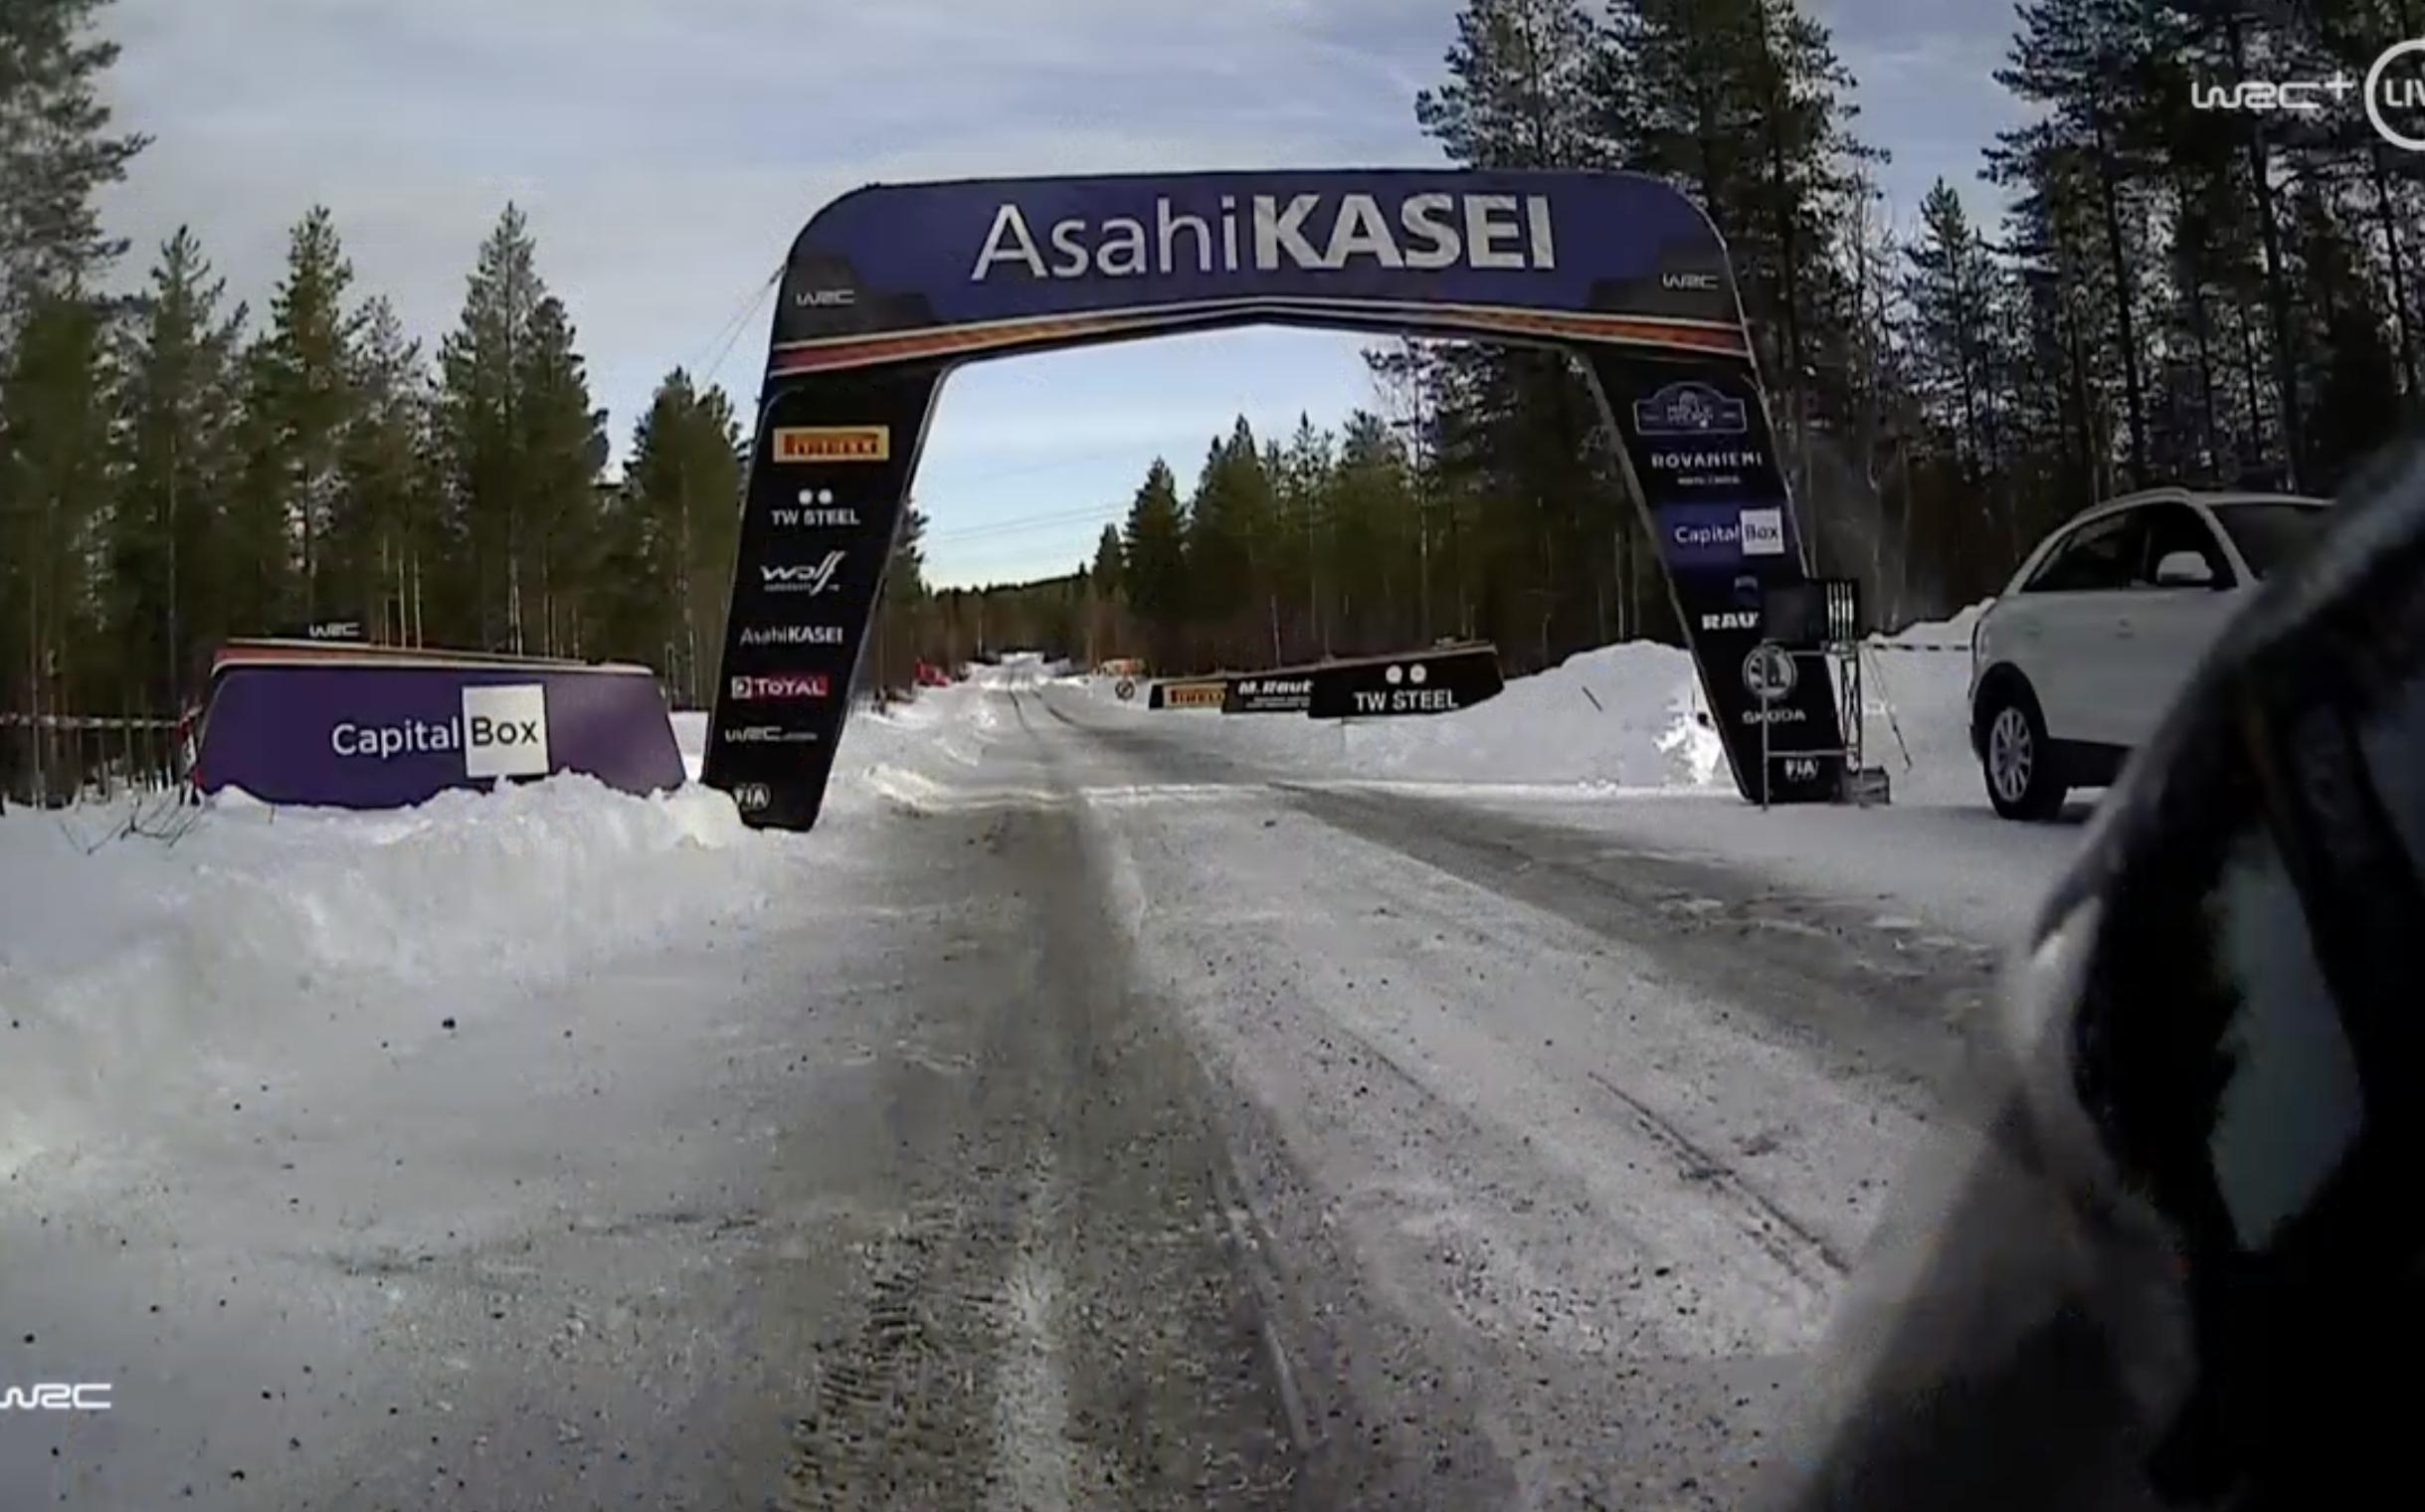 WRC: Arctic Rally Finland - Powered by CapitalBox [26-28 Febrero] - Página 7 Bertellistart